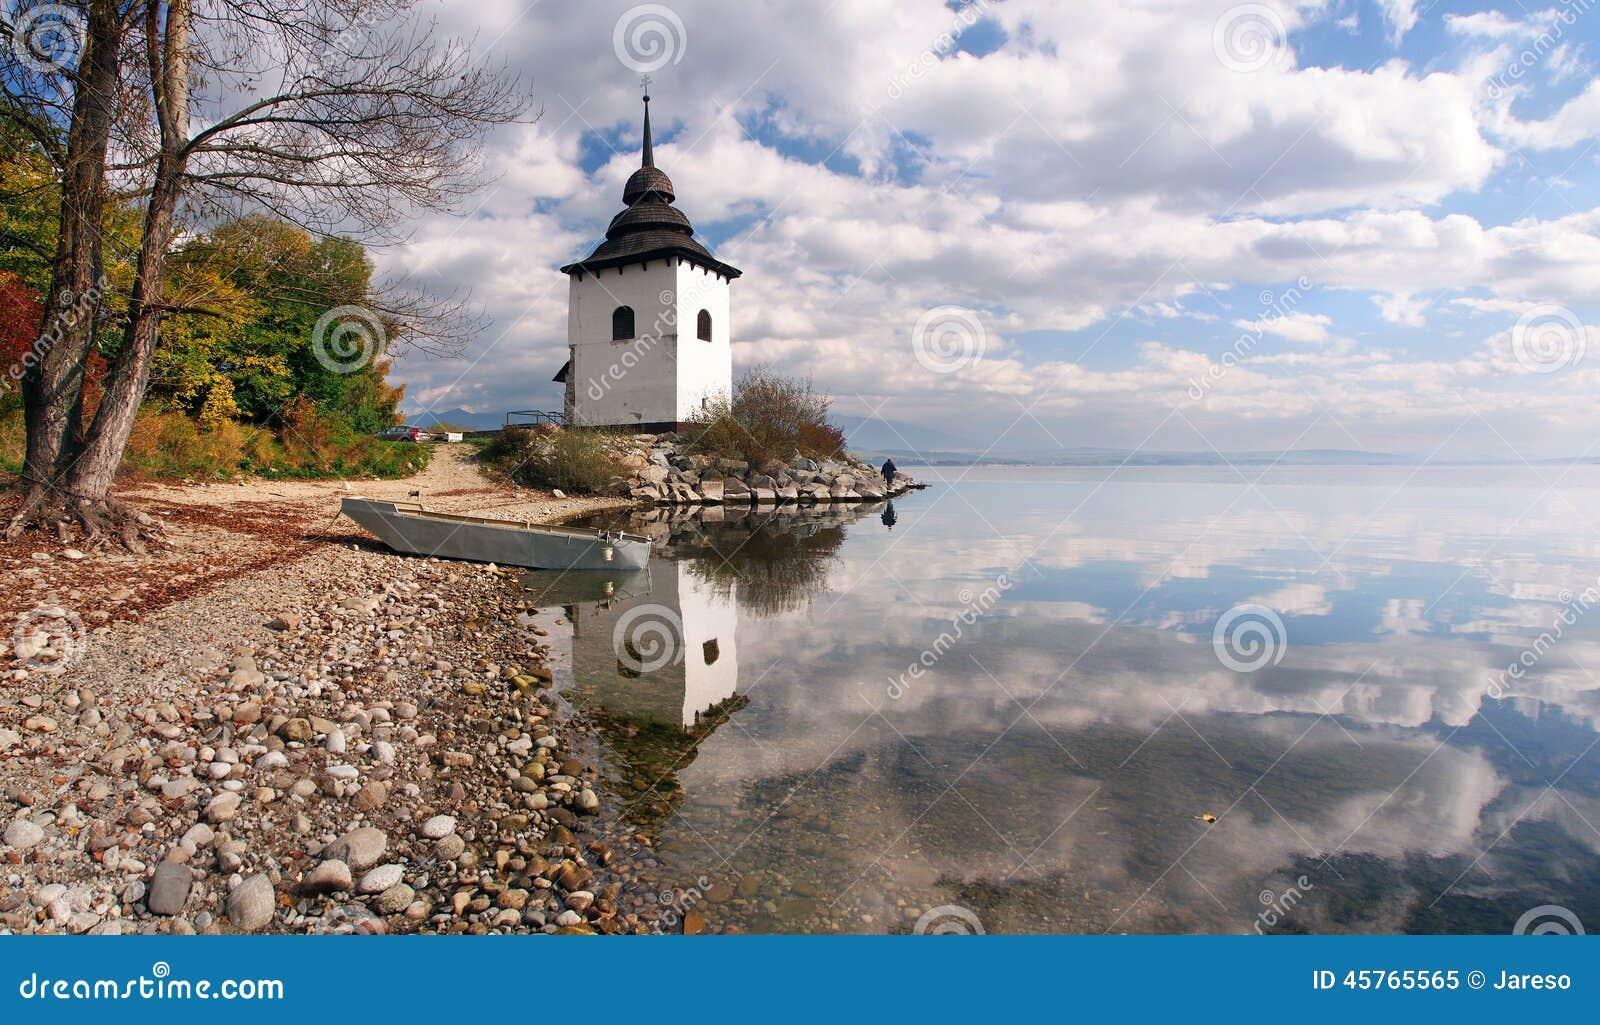 Reflection of tower at Liptovska Mara, Slovakia